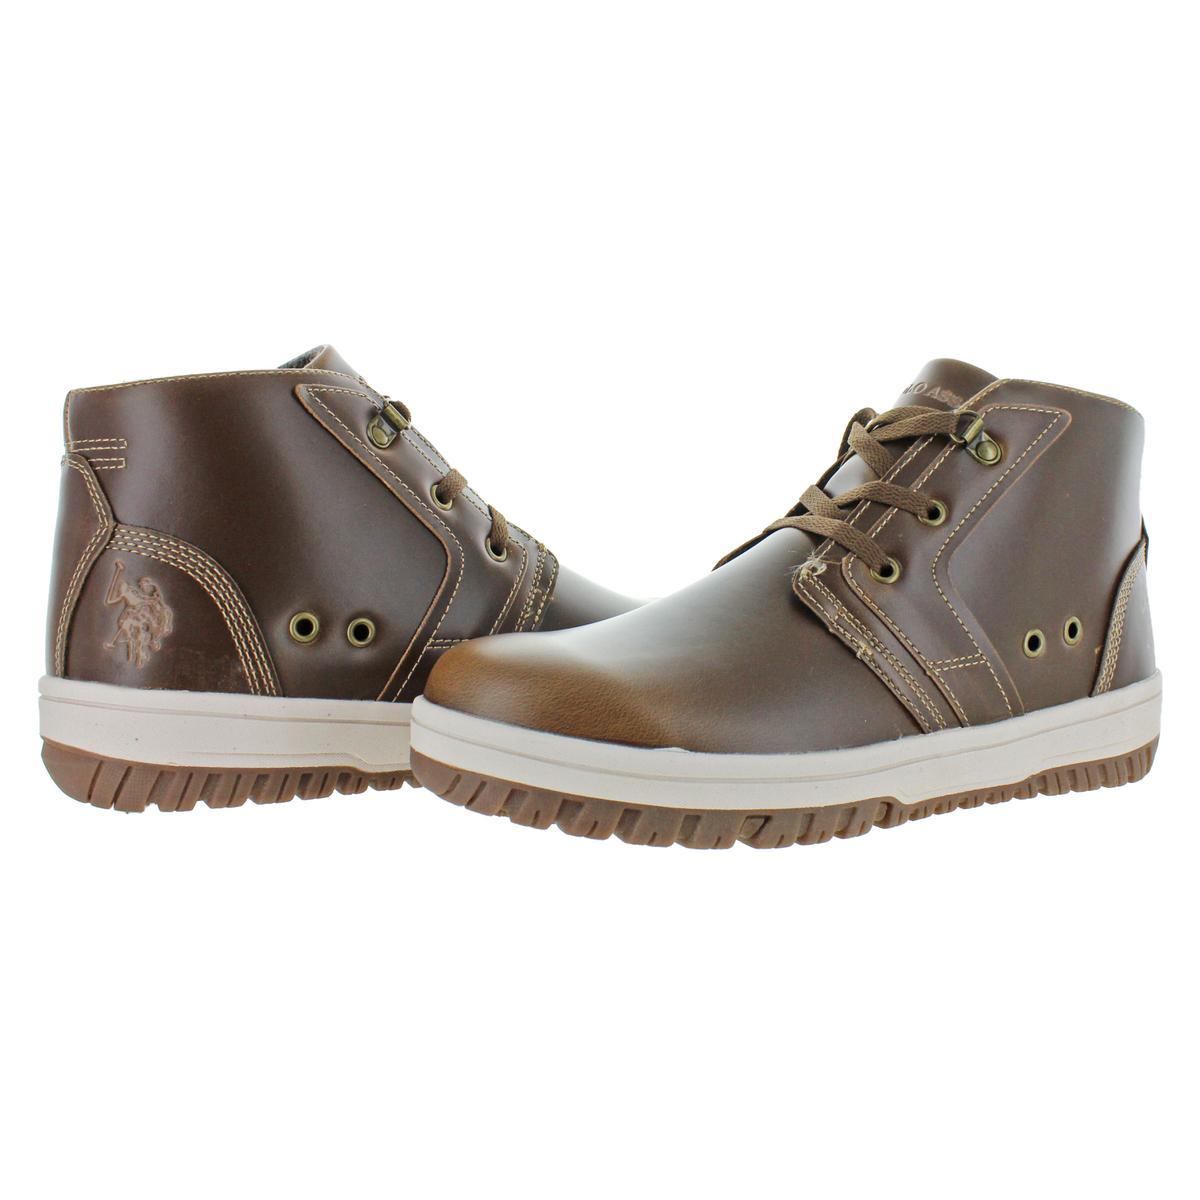 thumbnail 6 - U.S. Polo Assn. Bruno Men's Fashion Chukka Ankle Boots